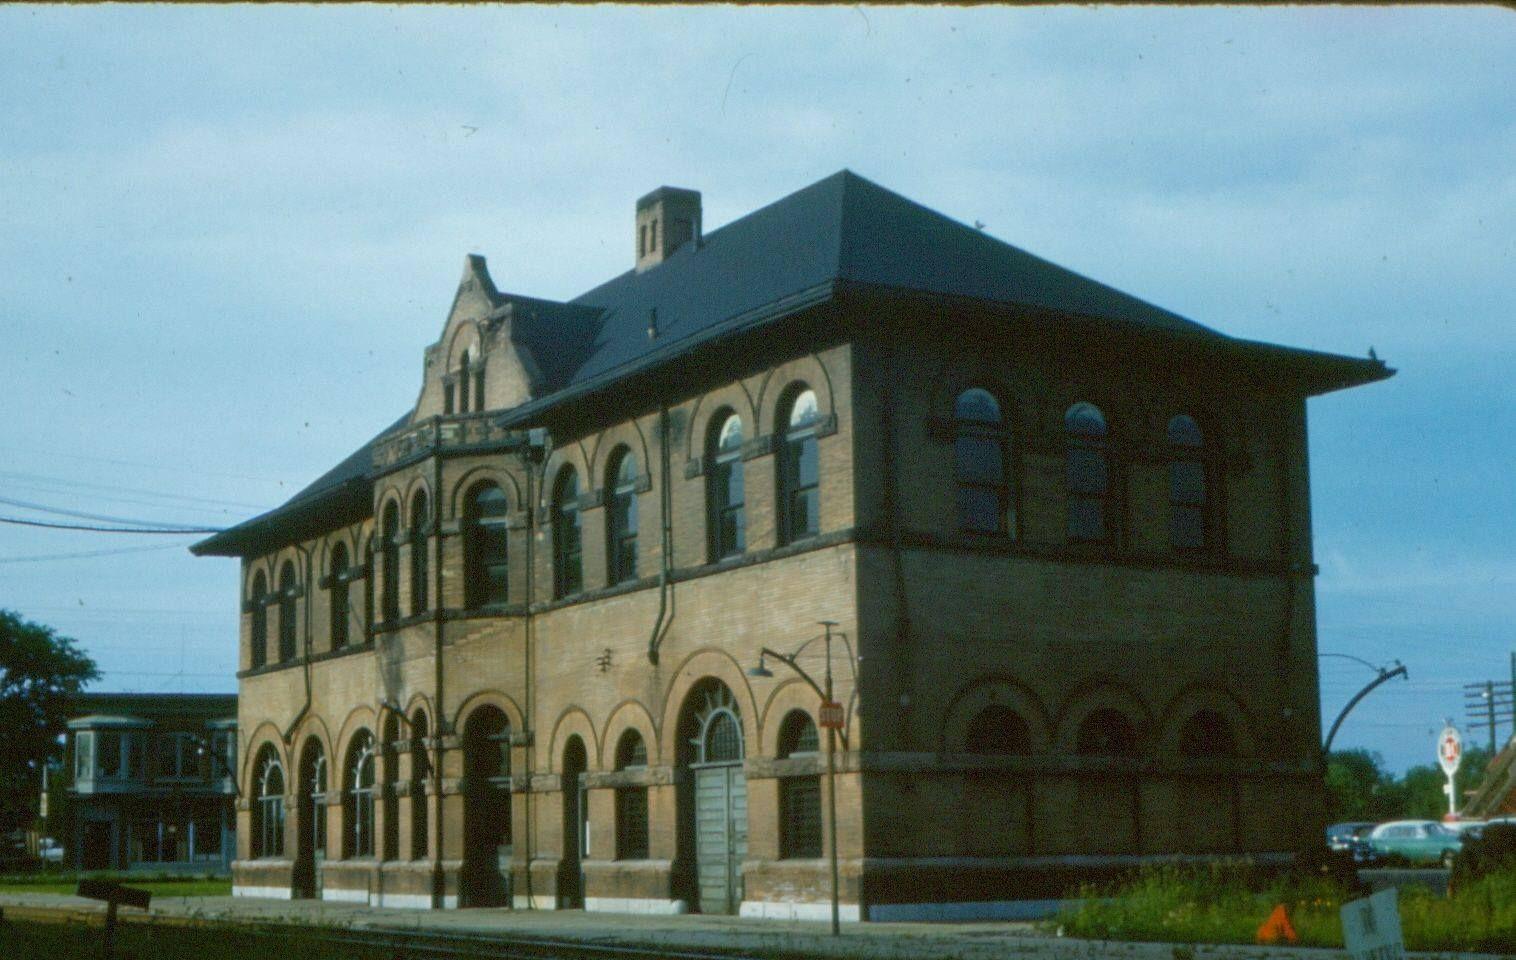 Lehigh Valley station, Auburn, NY Lehigh valley, The